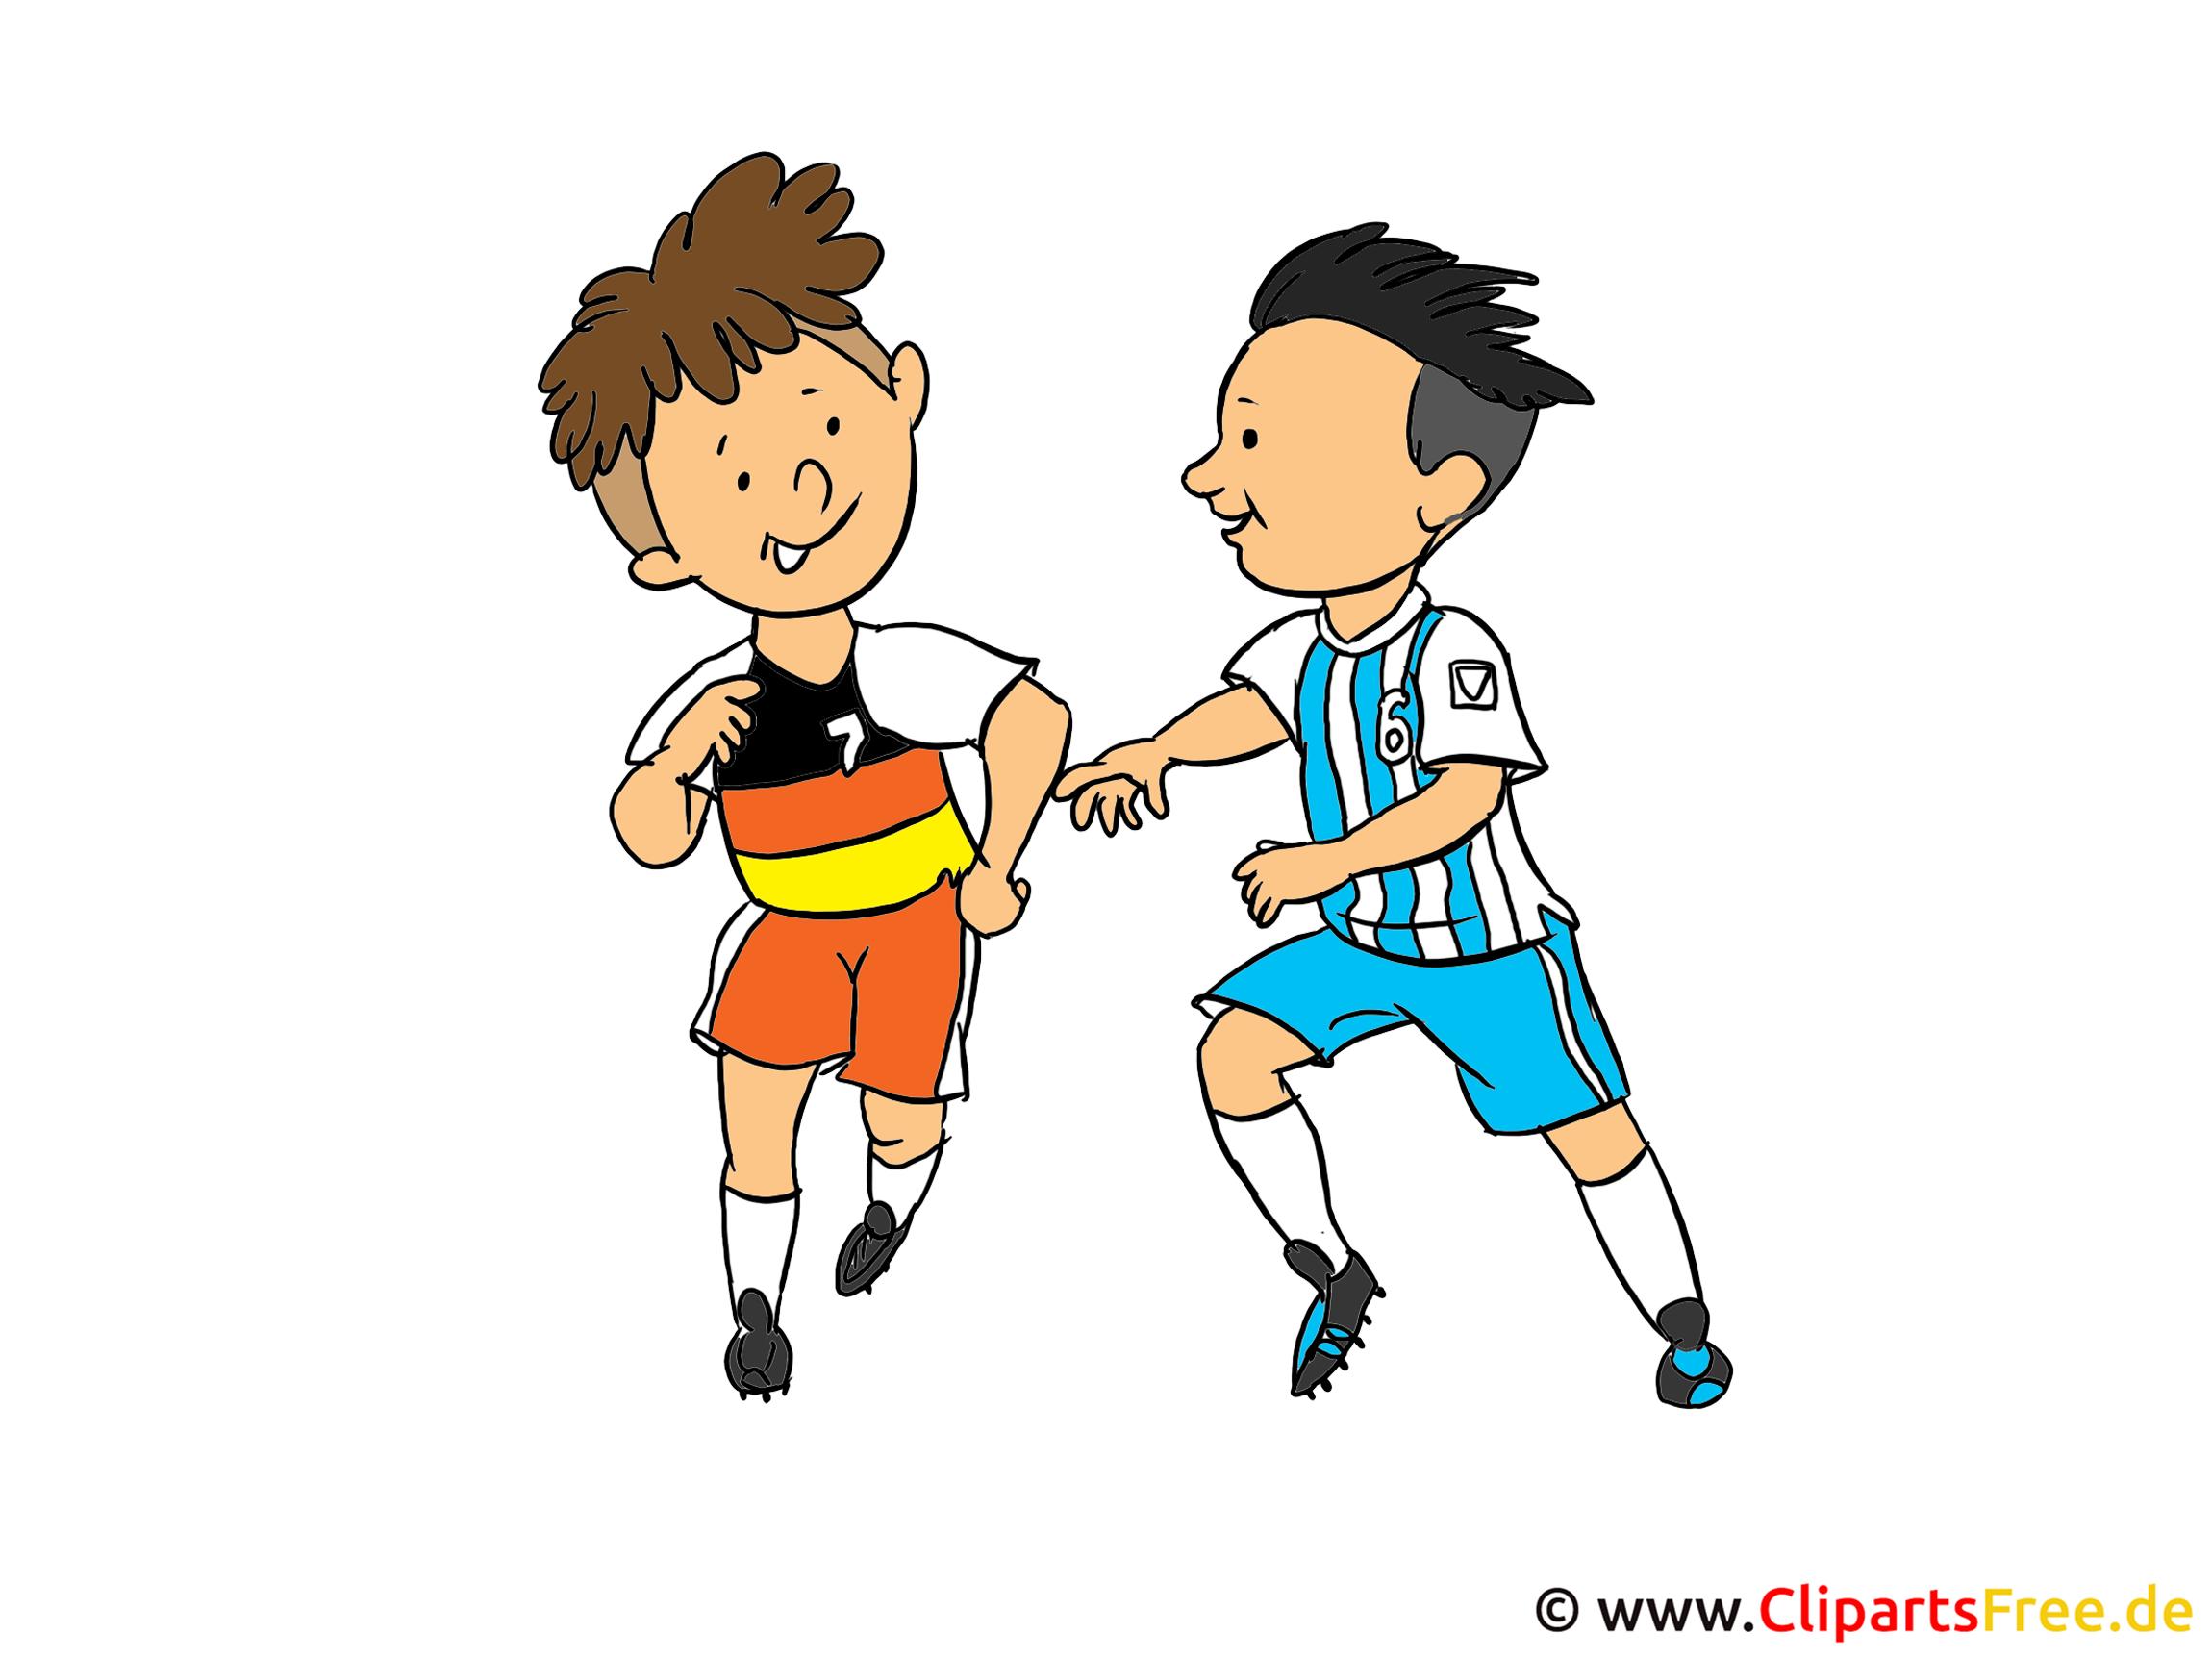 Fussball Cartoon Clipart Kinder Abclicun Gq